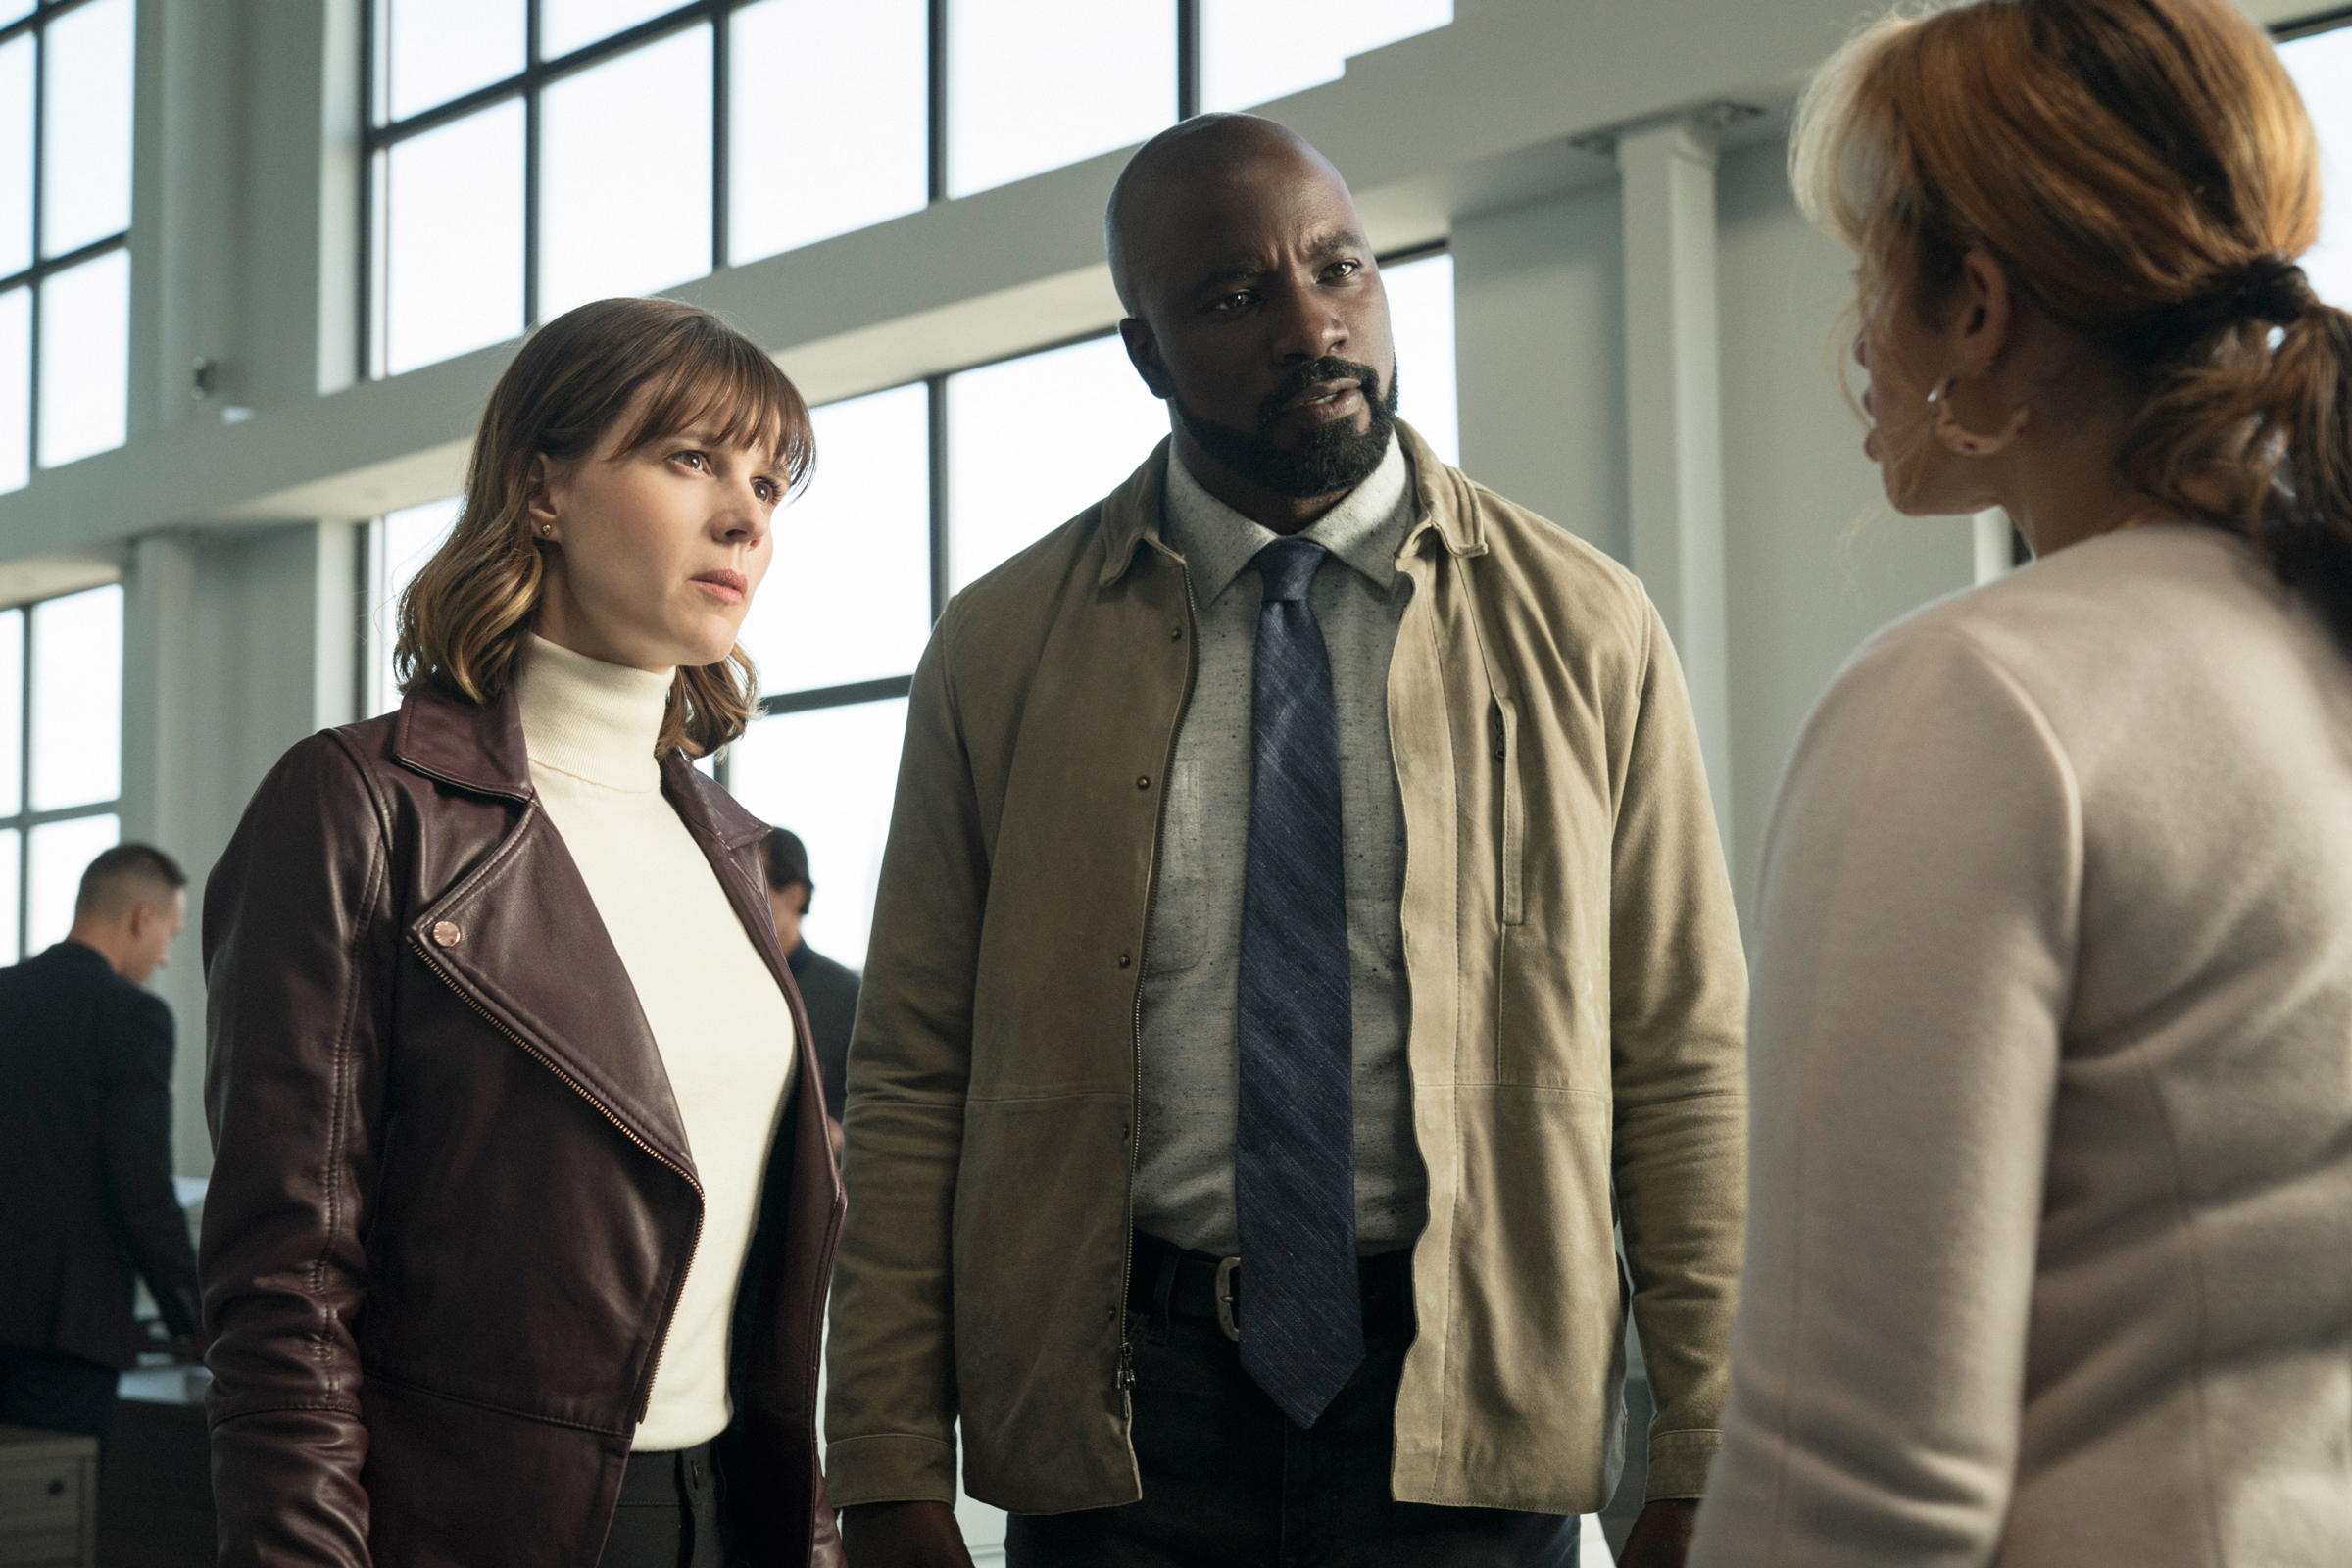 'Evil' Review: 'Good Wife' Creators Explore Their Dark Side